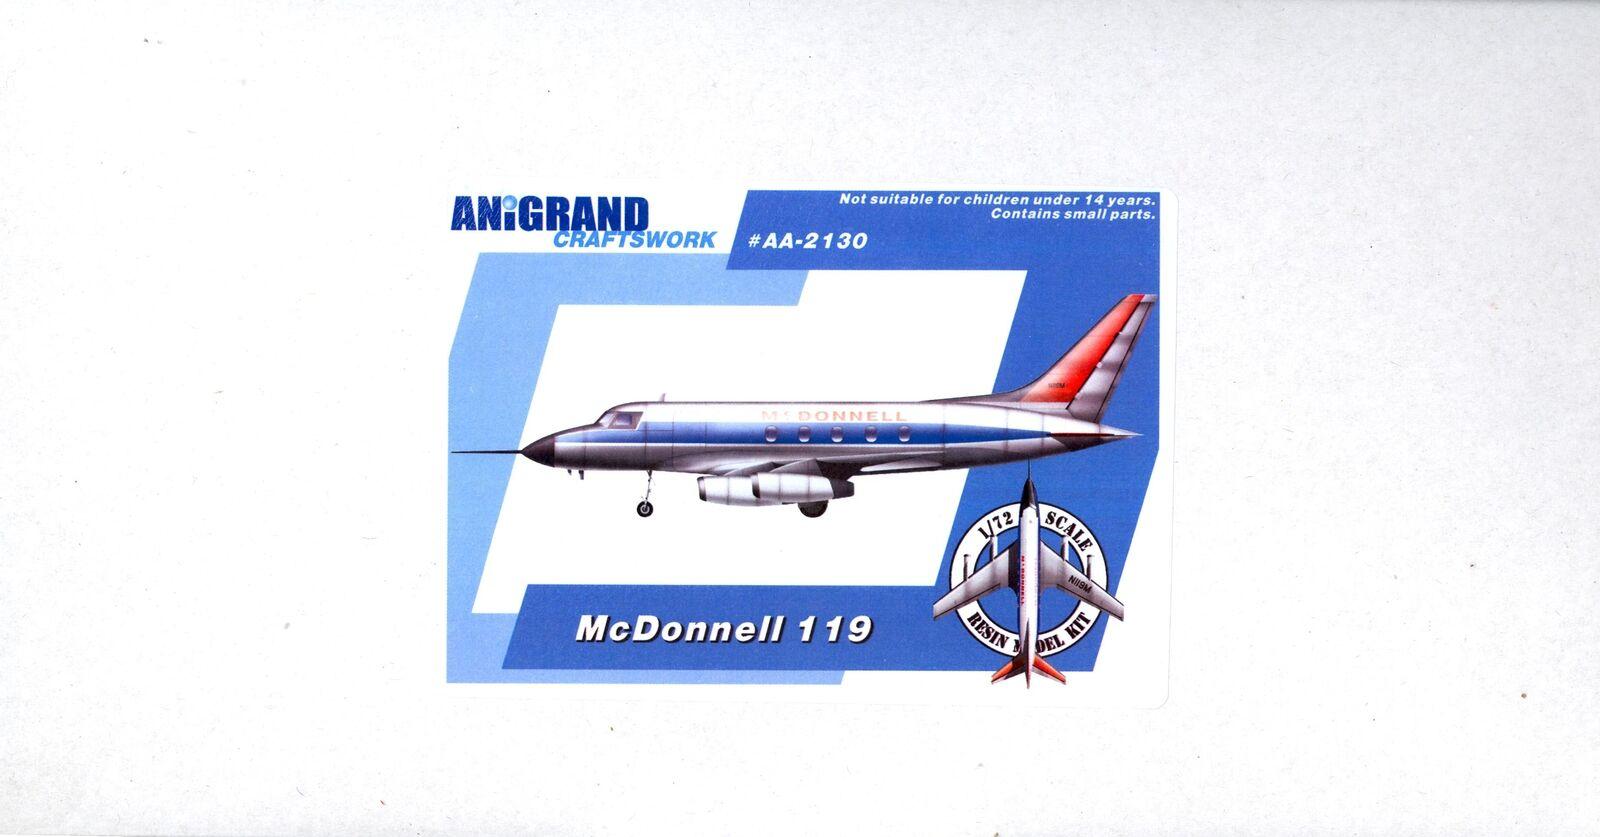 Anigrand Models 1 72 MCDONNELL 119 Business Jet